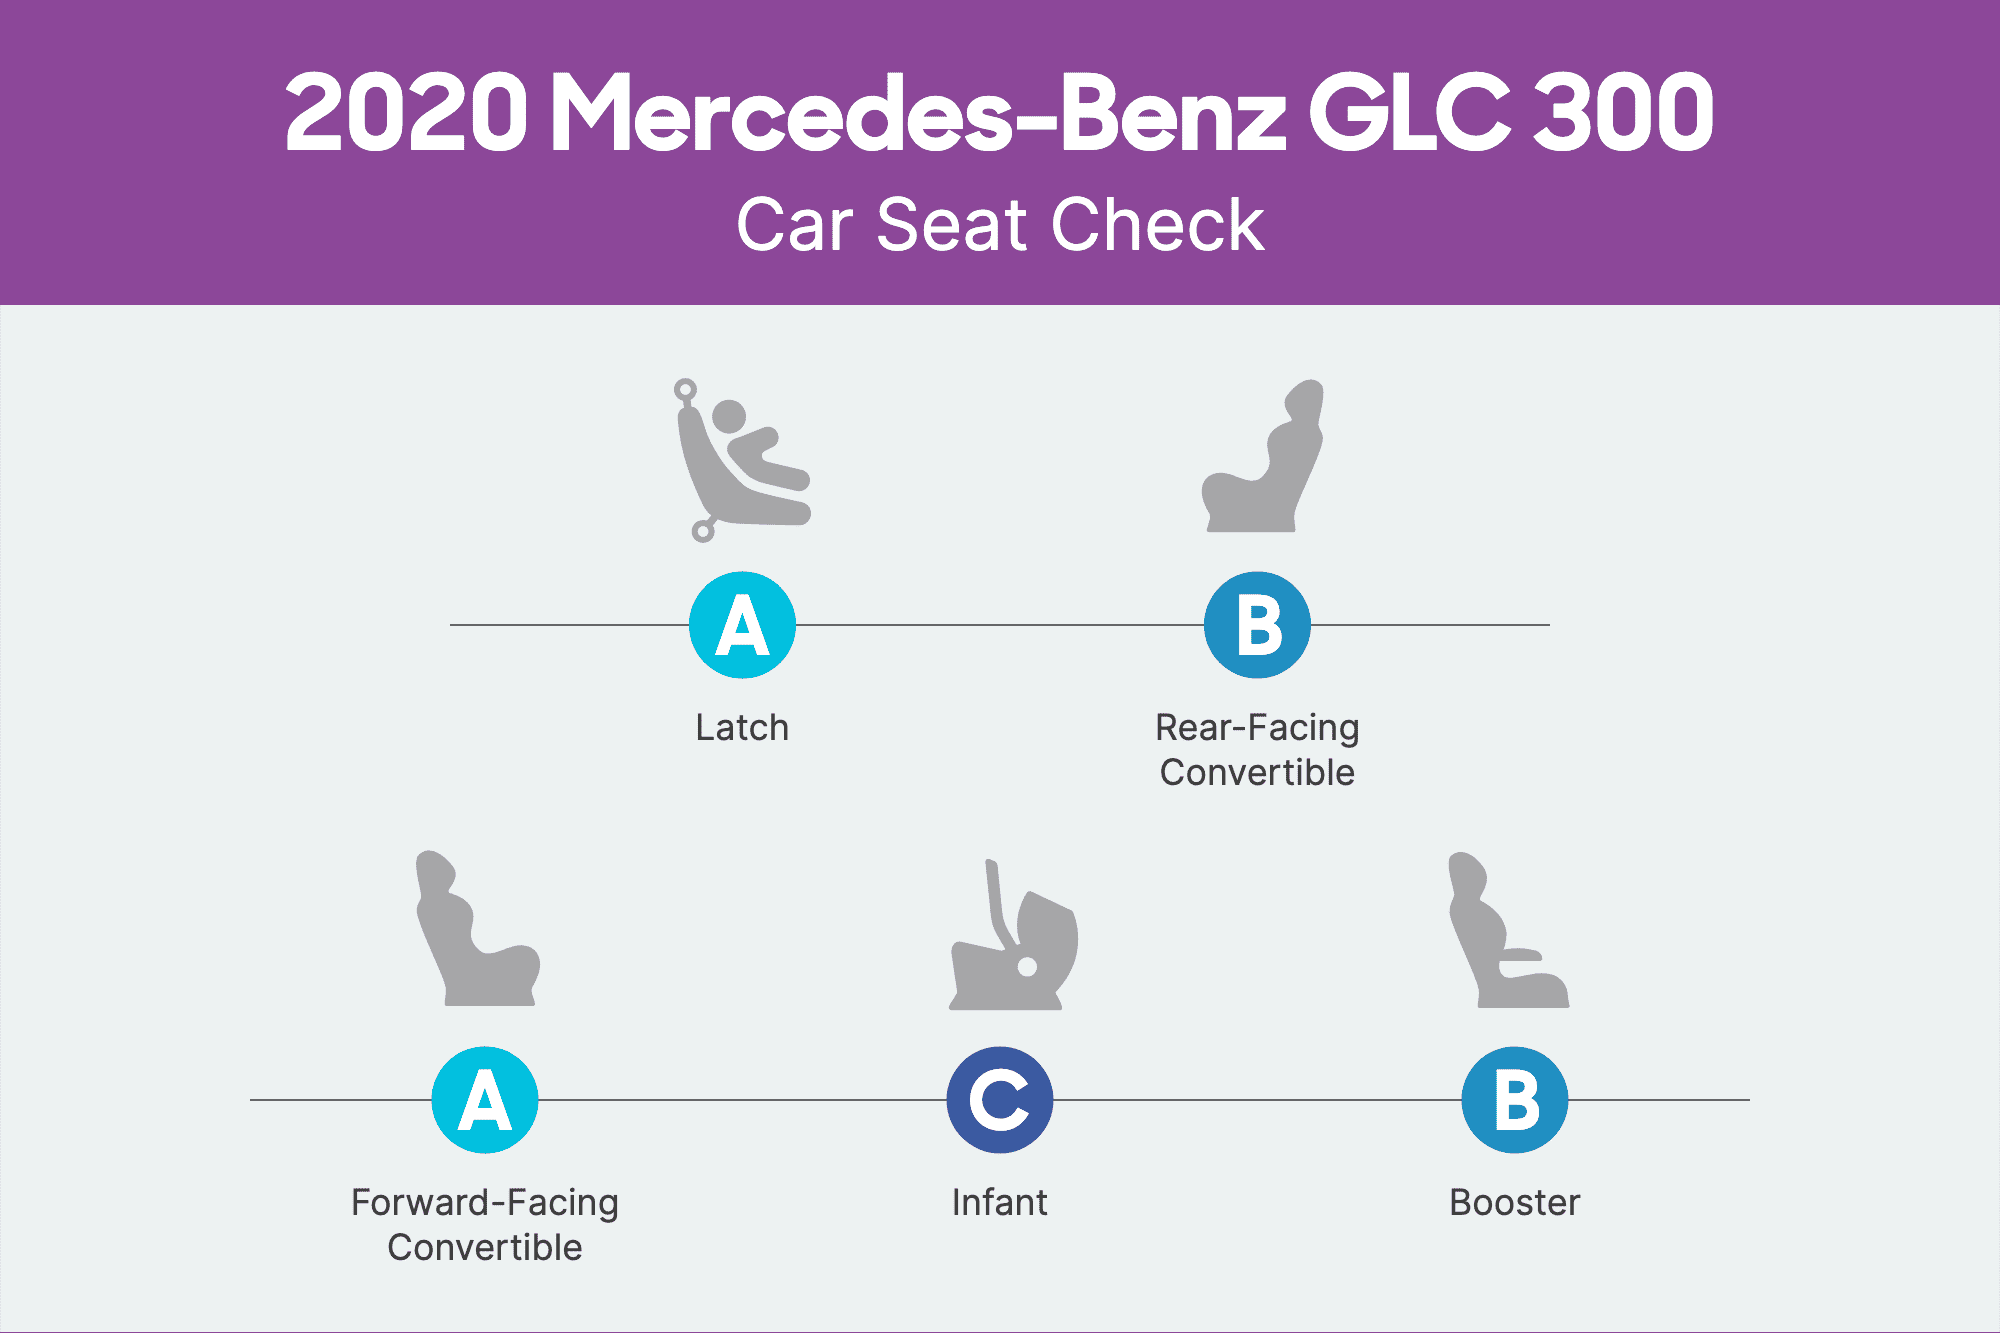 How Do Car Seats Fit in a 2020 Mercedes-Benz GLC300? via @carsdotcom